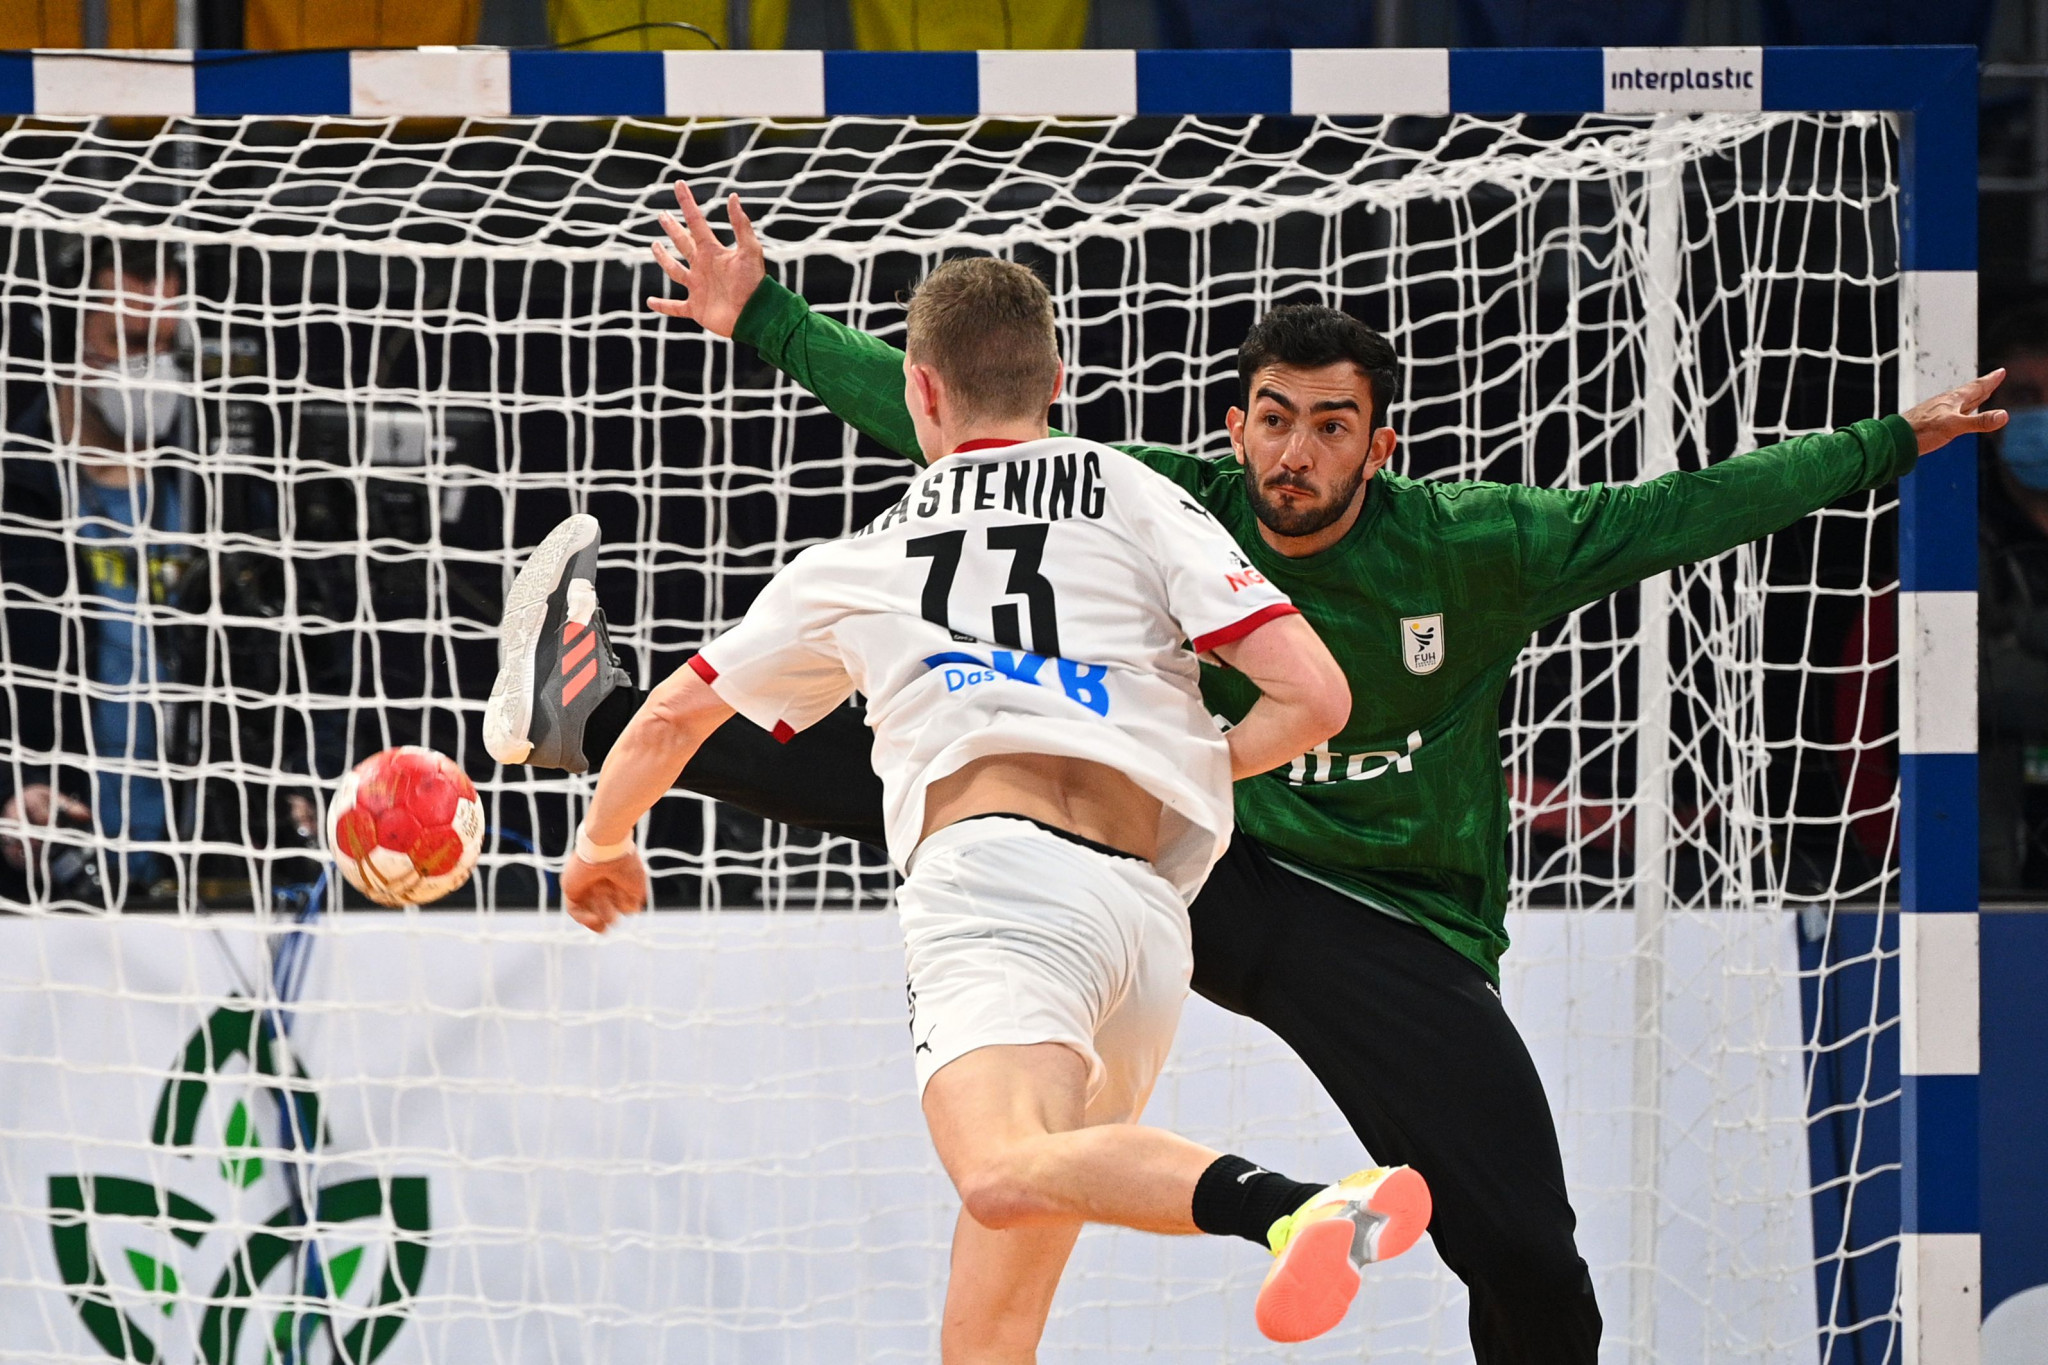 Germany record emphatic win as group action continues at IHF World Men's Handball Championship